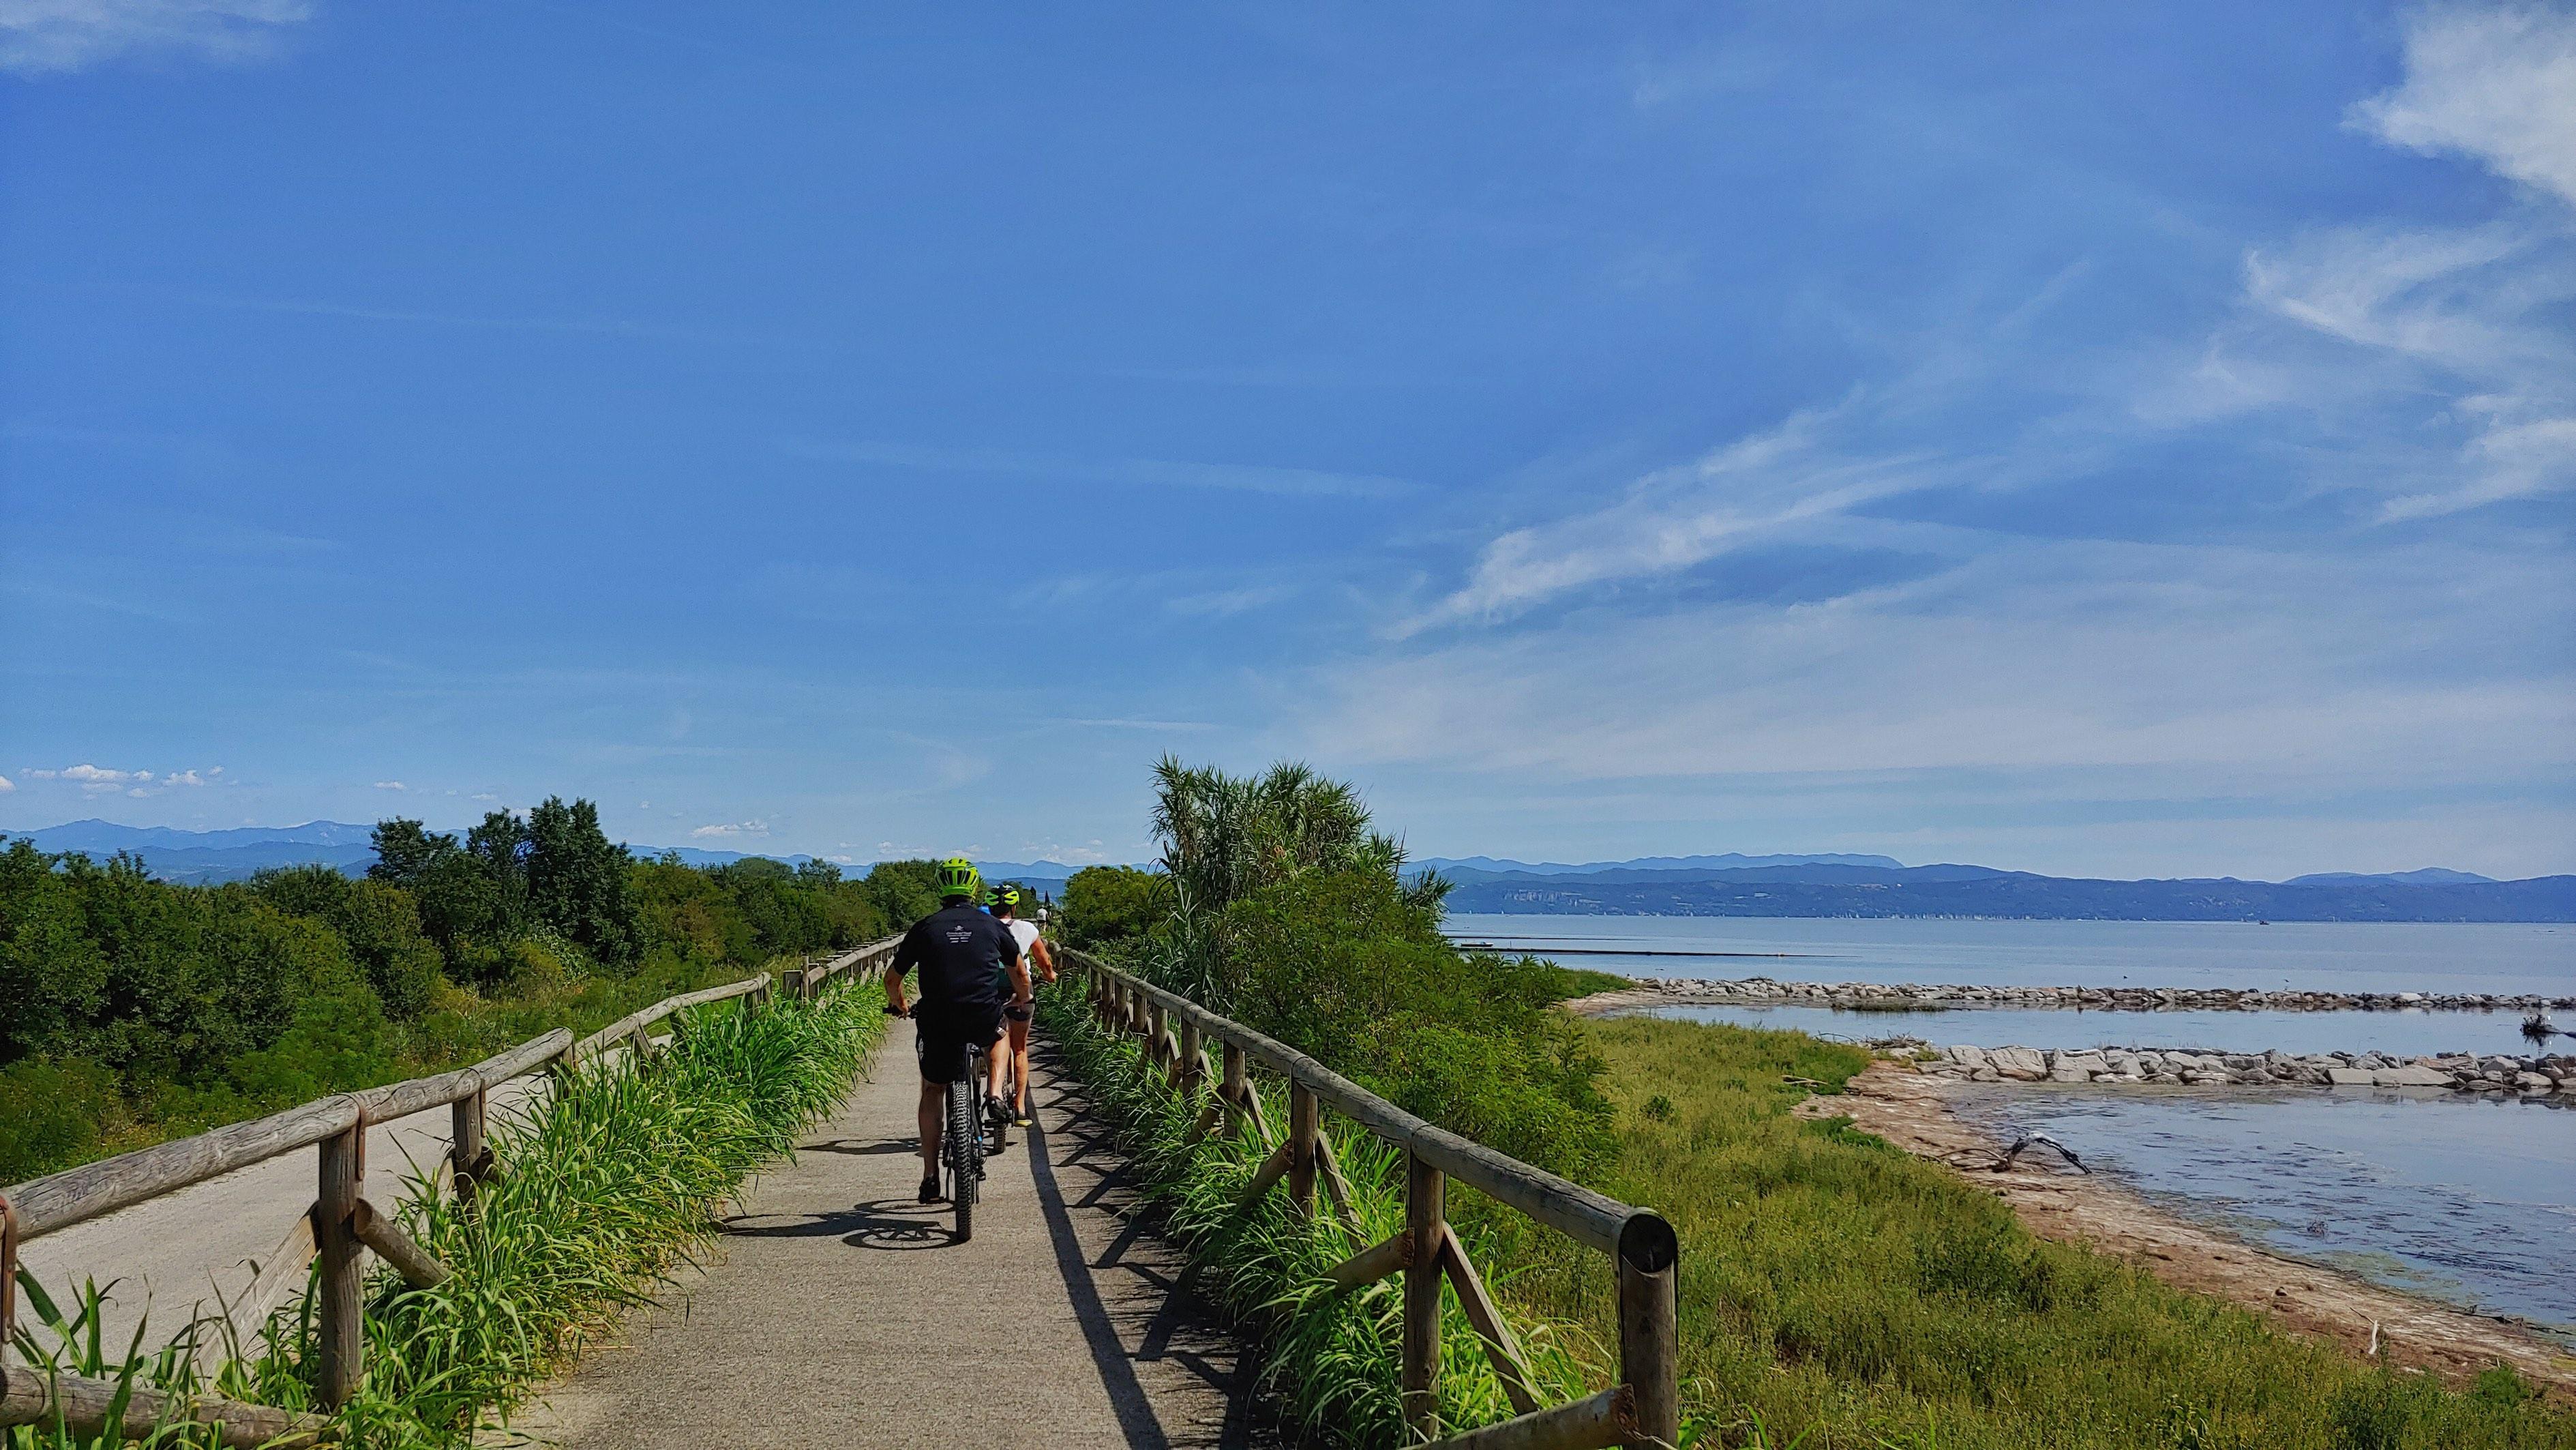 Biciclette-Grado-Foto Enrico Cester